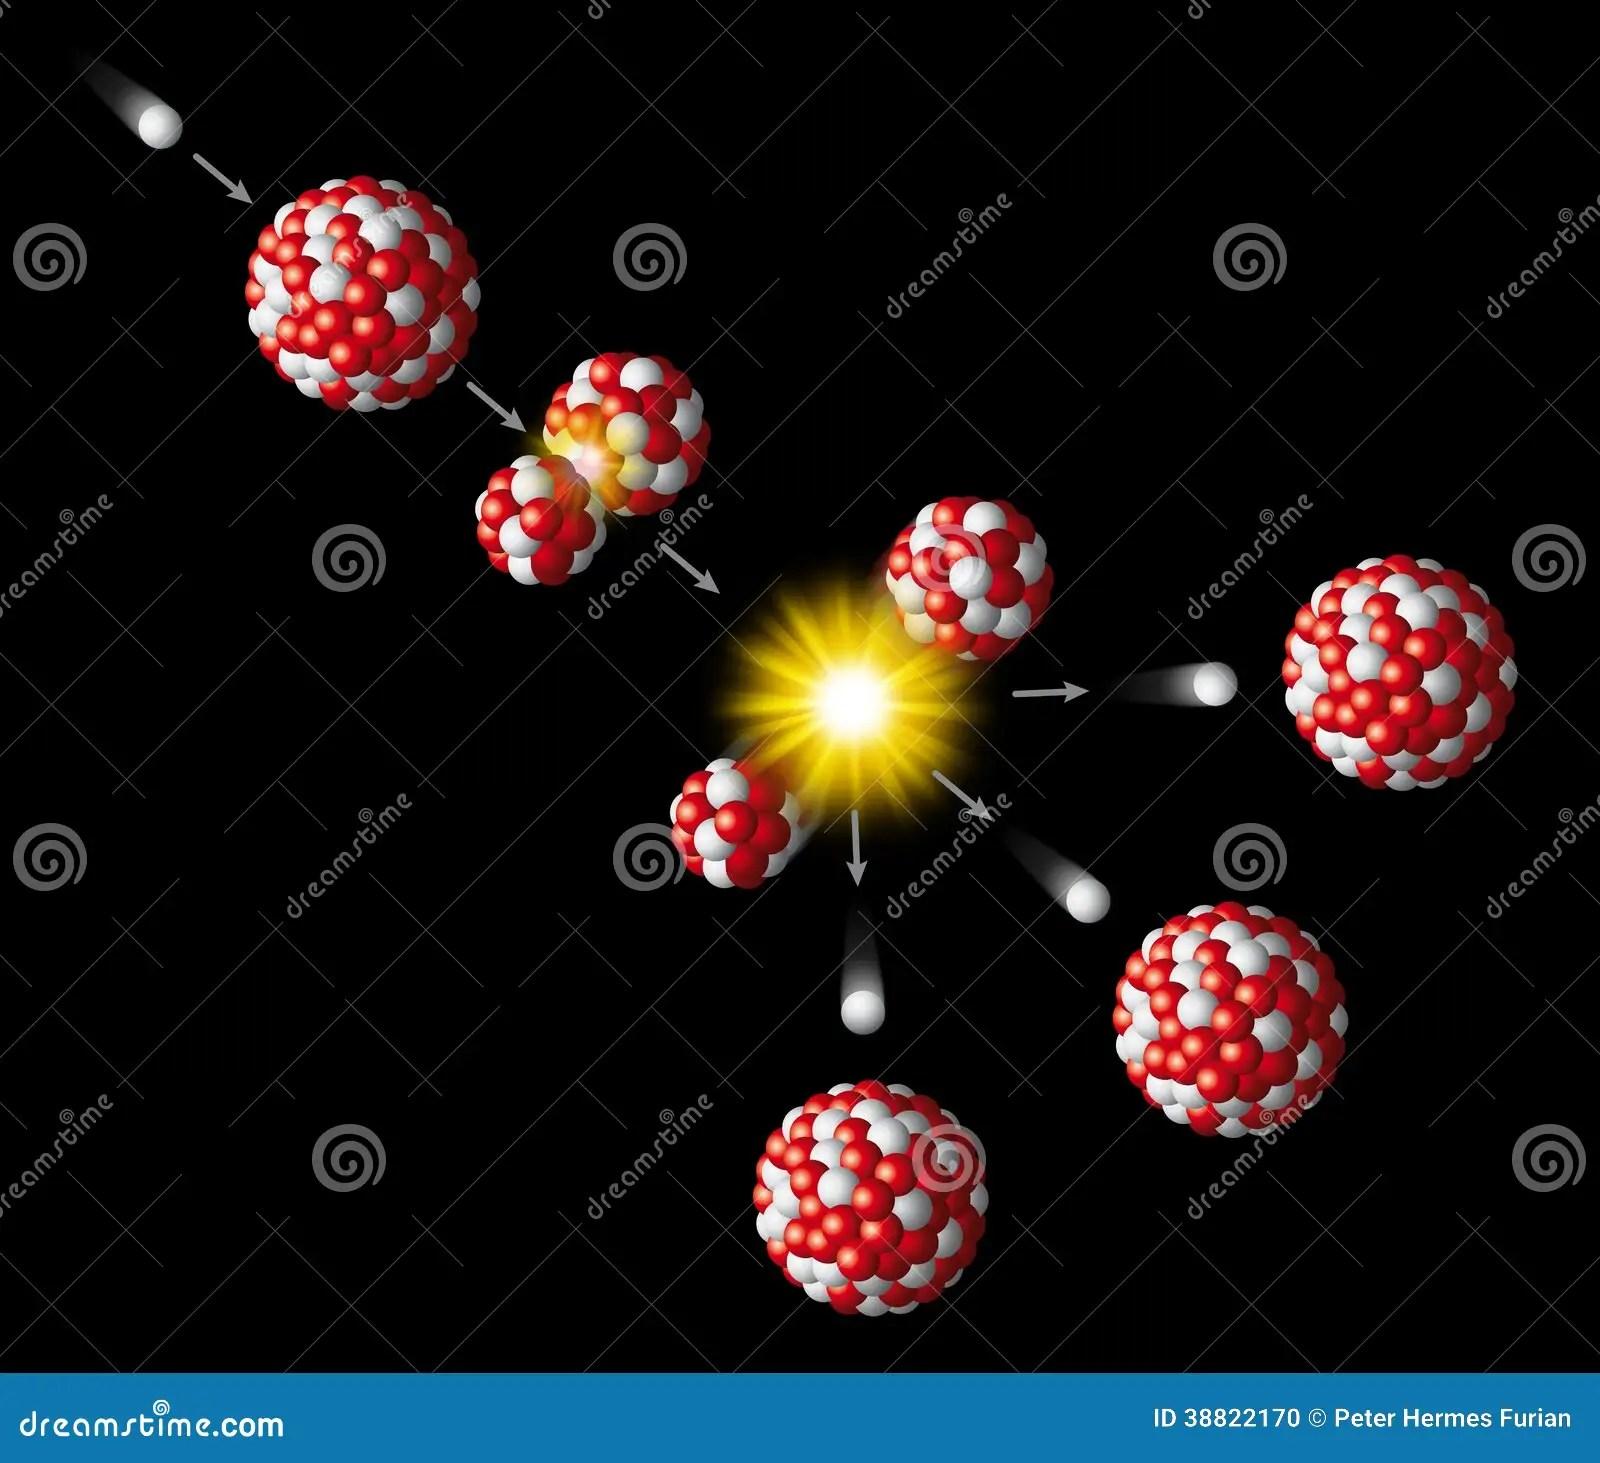 Gamma Rays Diagram Gamma Radiation Diagram Free Download Wiring